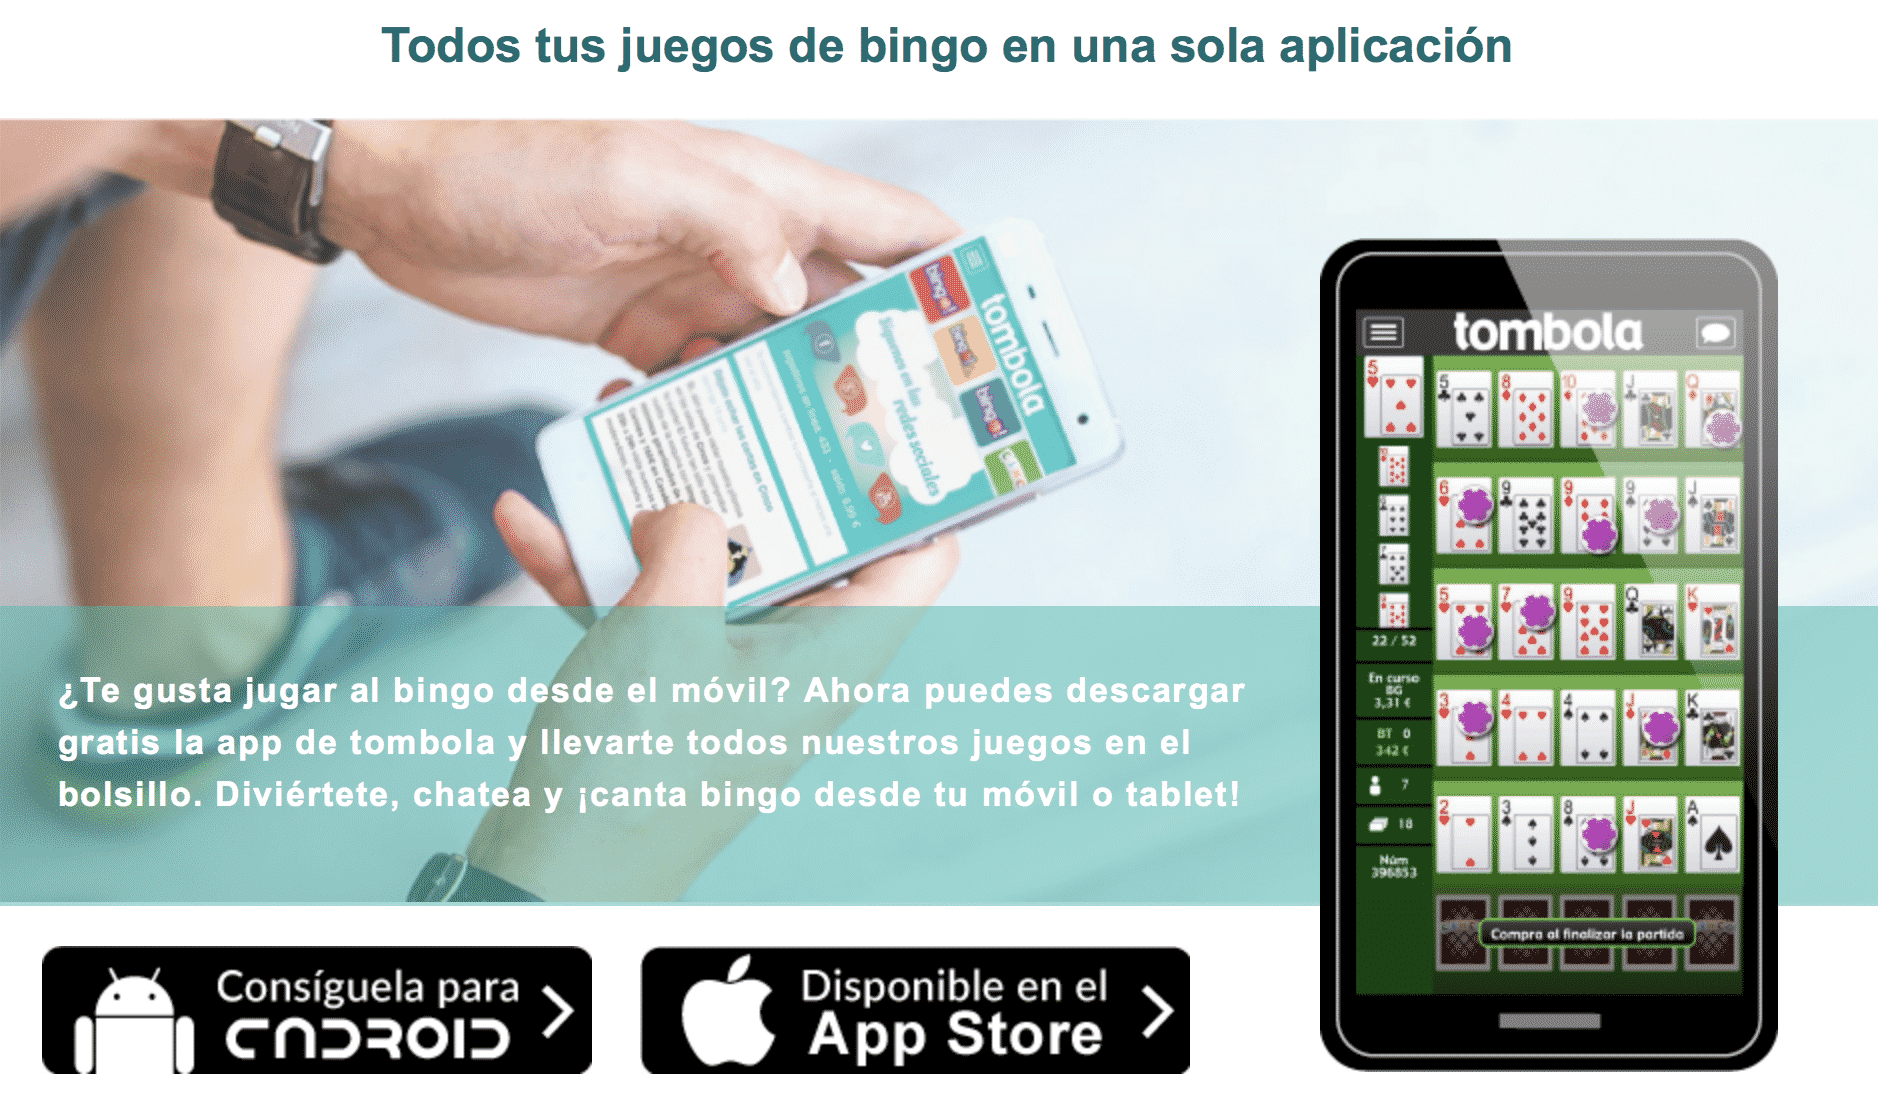 Bingo tombola online opiniones Sportsbook-320339